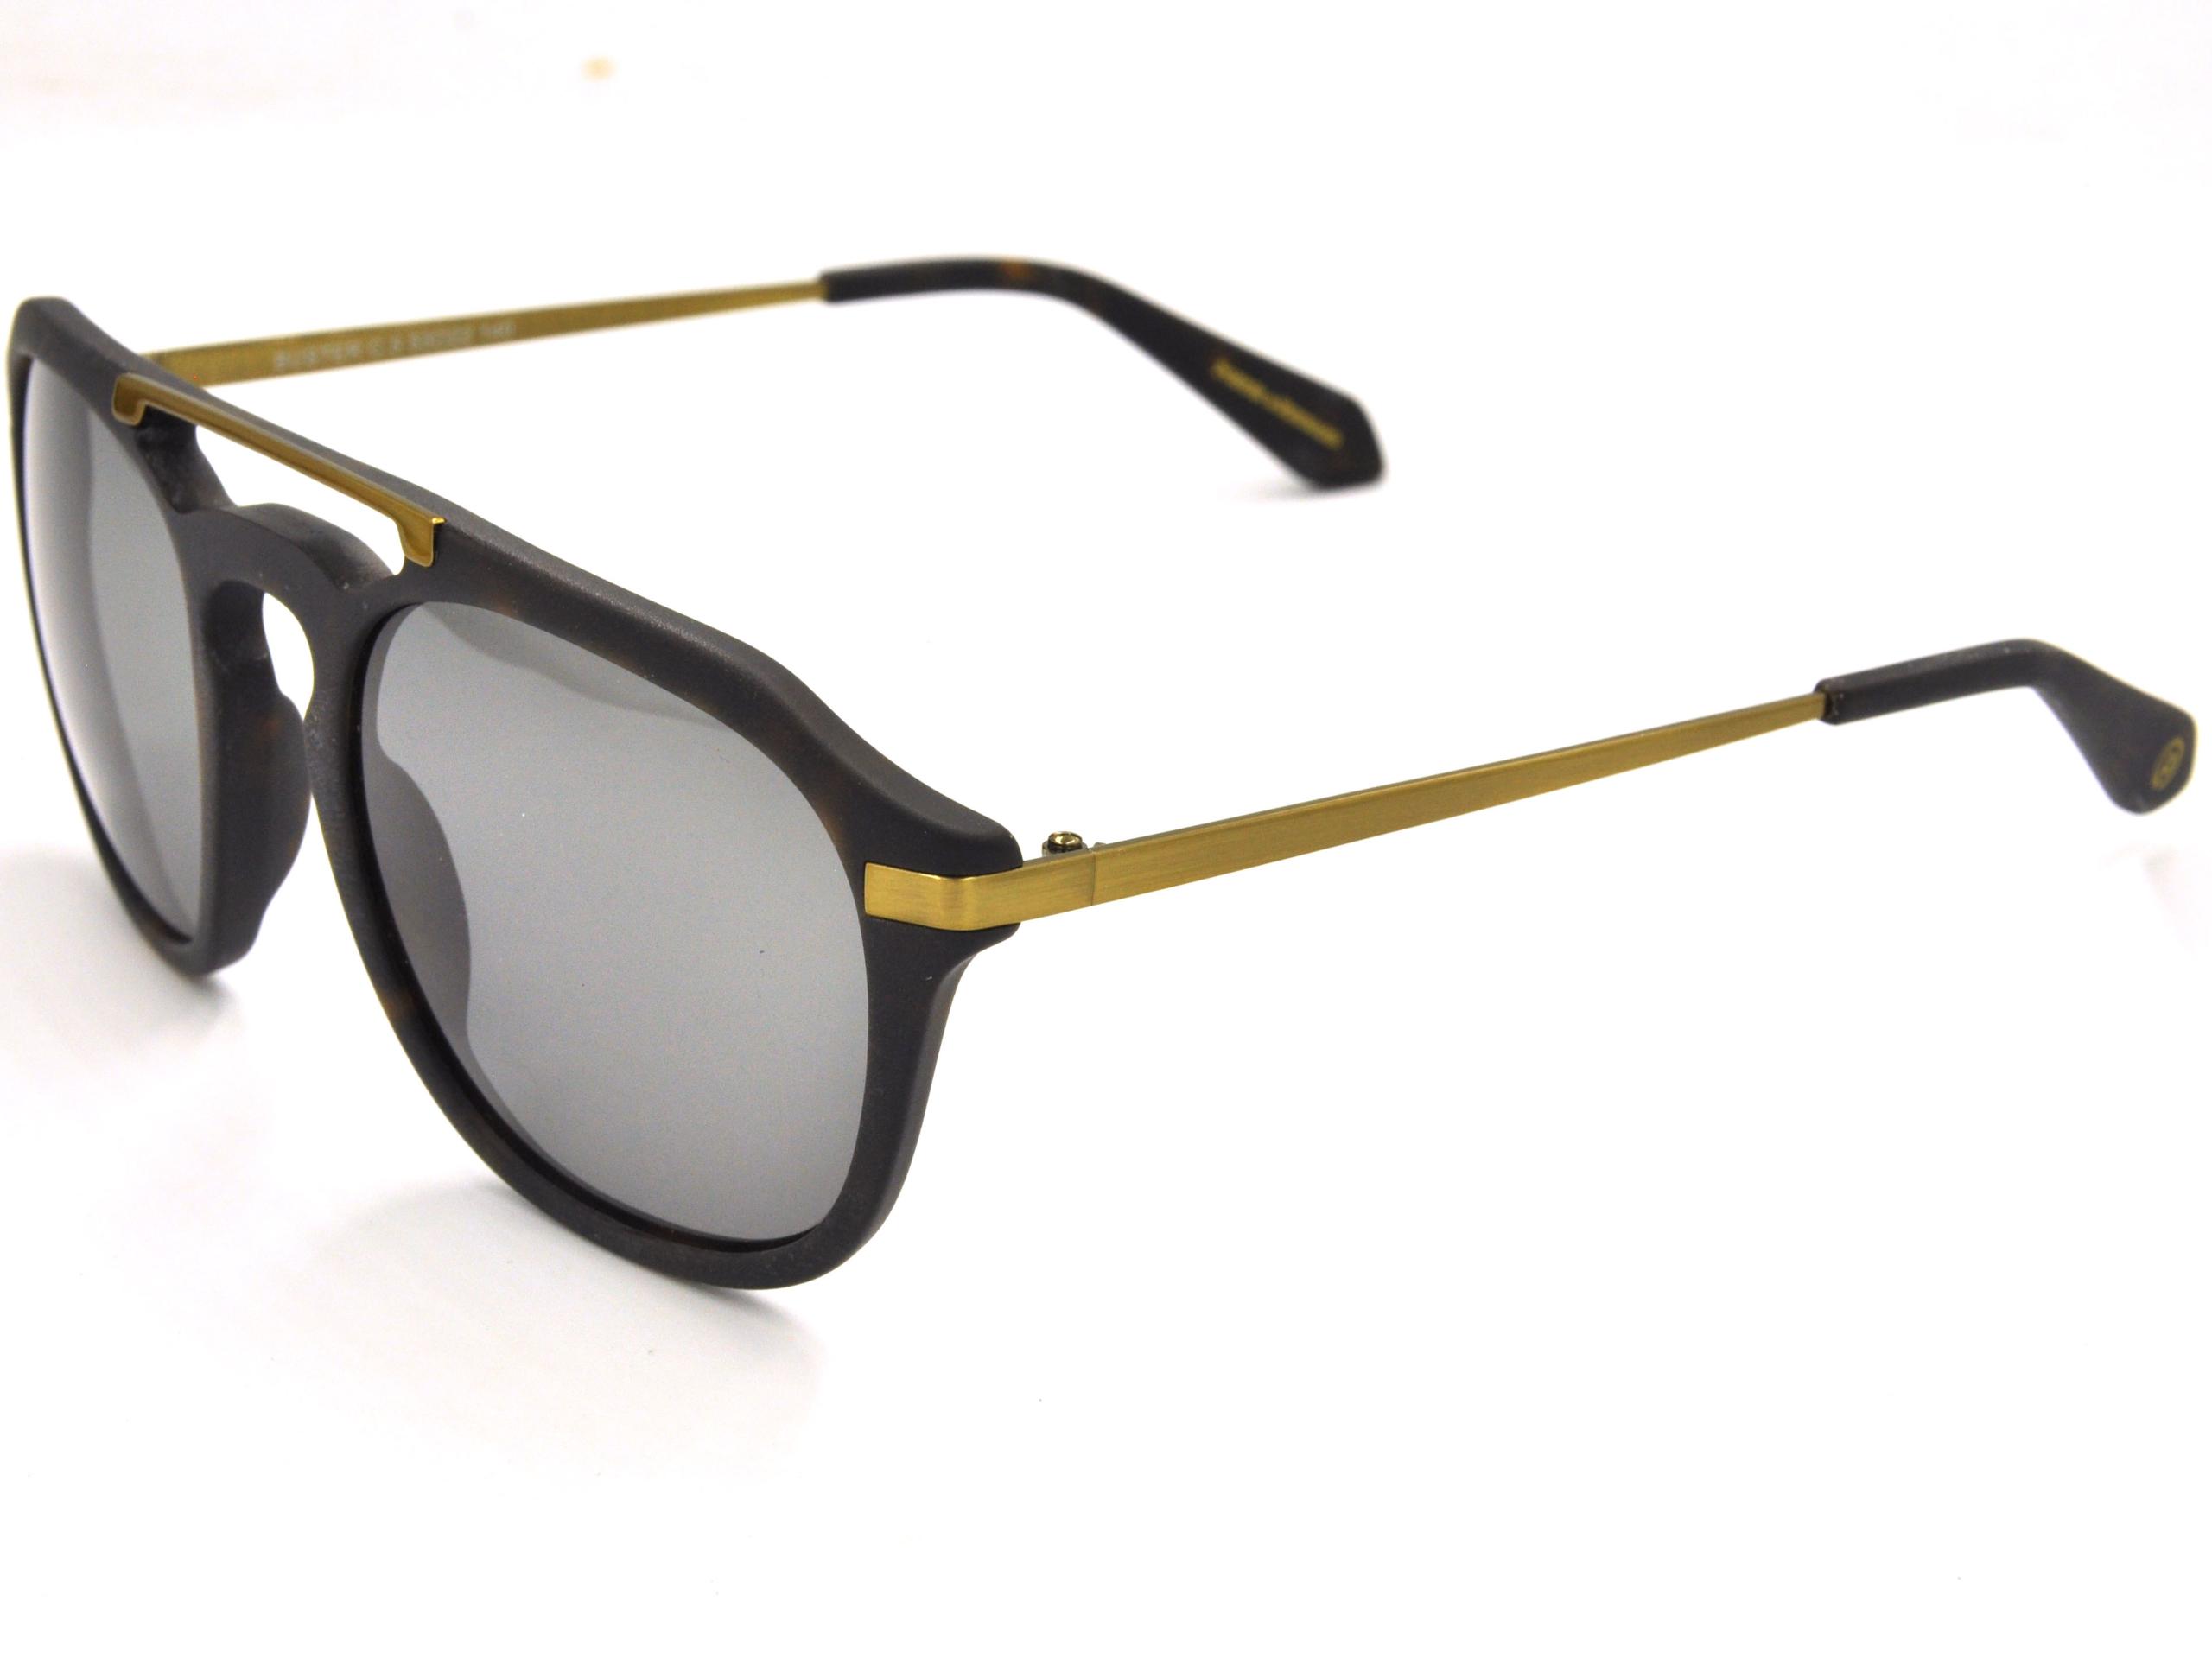 PORTER & REYNARD BUSTER C5 Sunglasses 2020